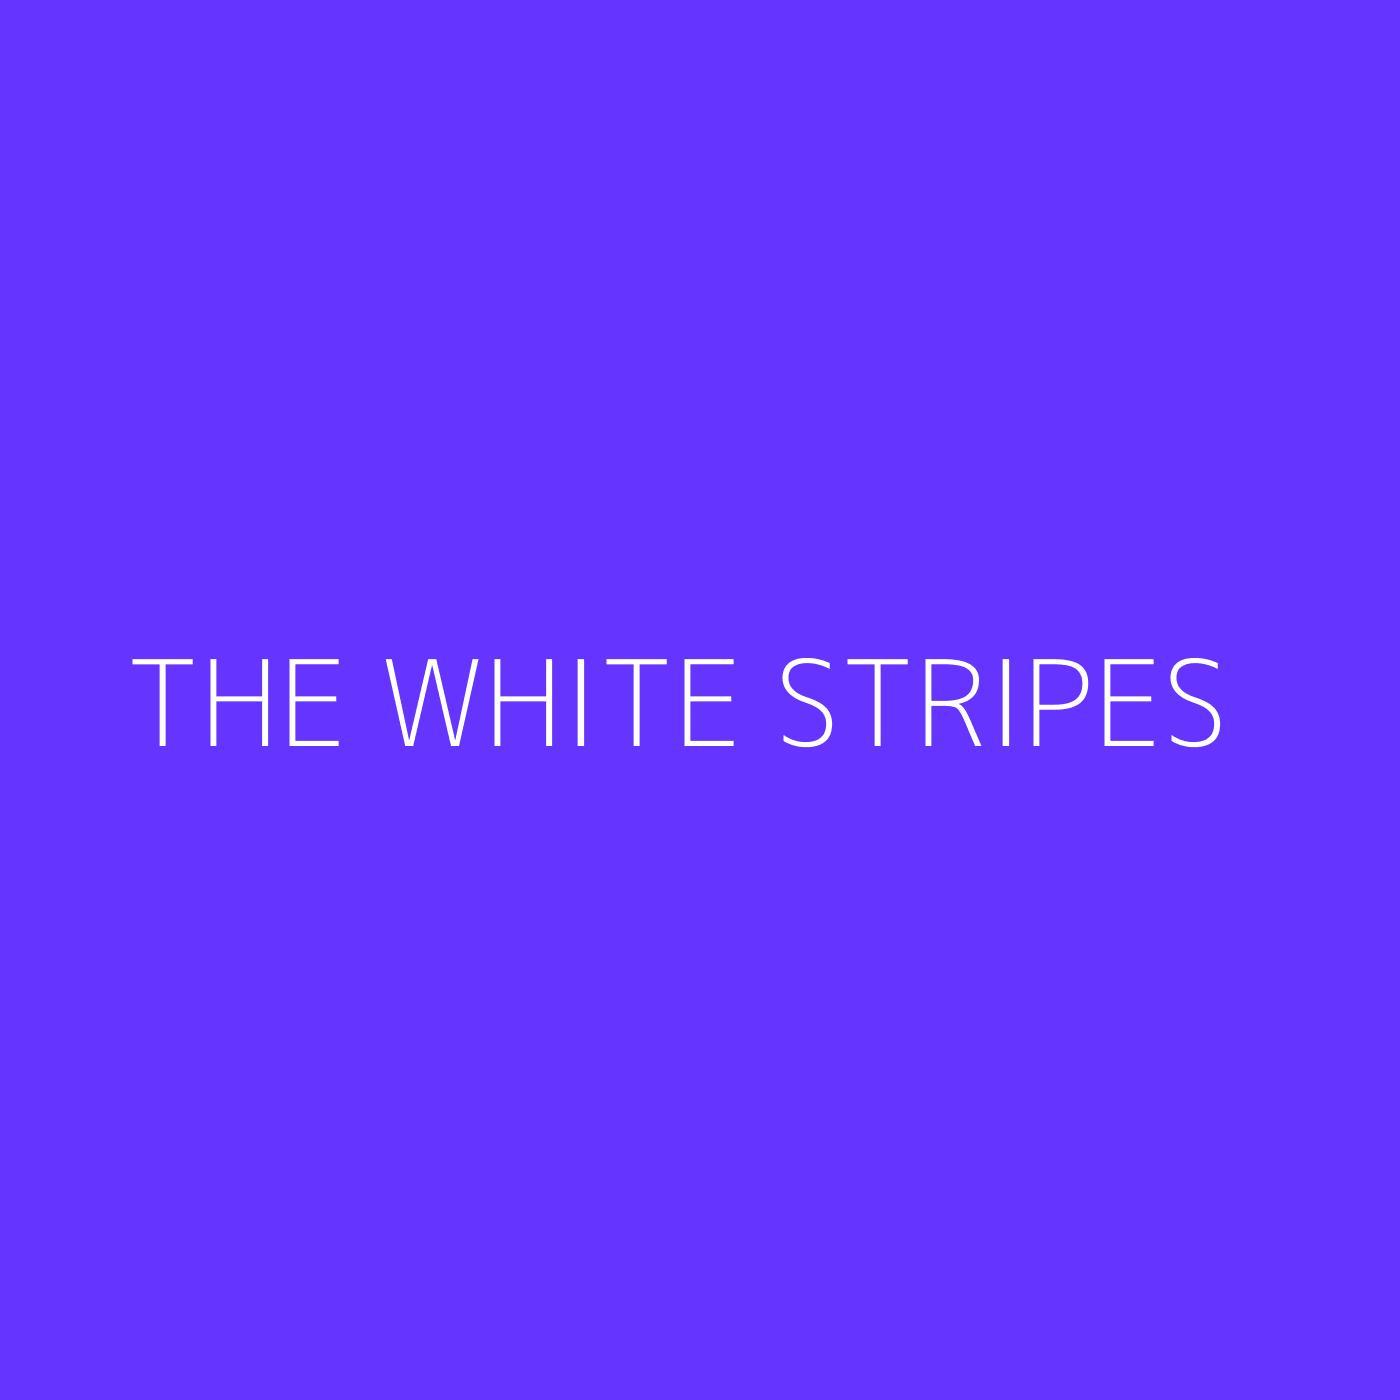 The White Stripes Playlist Artwork